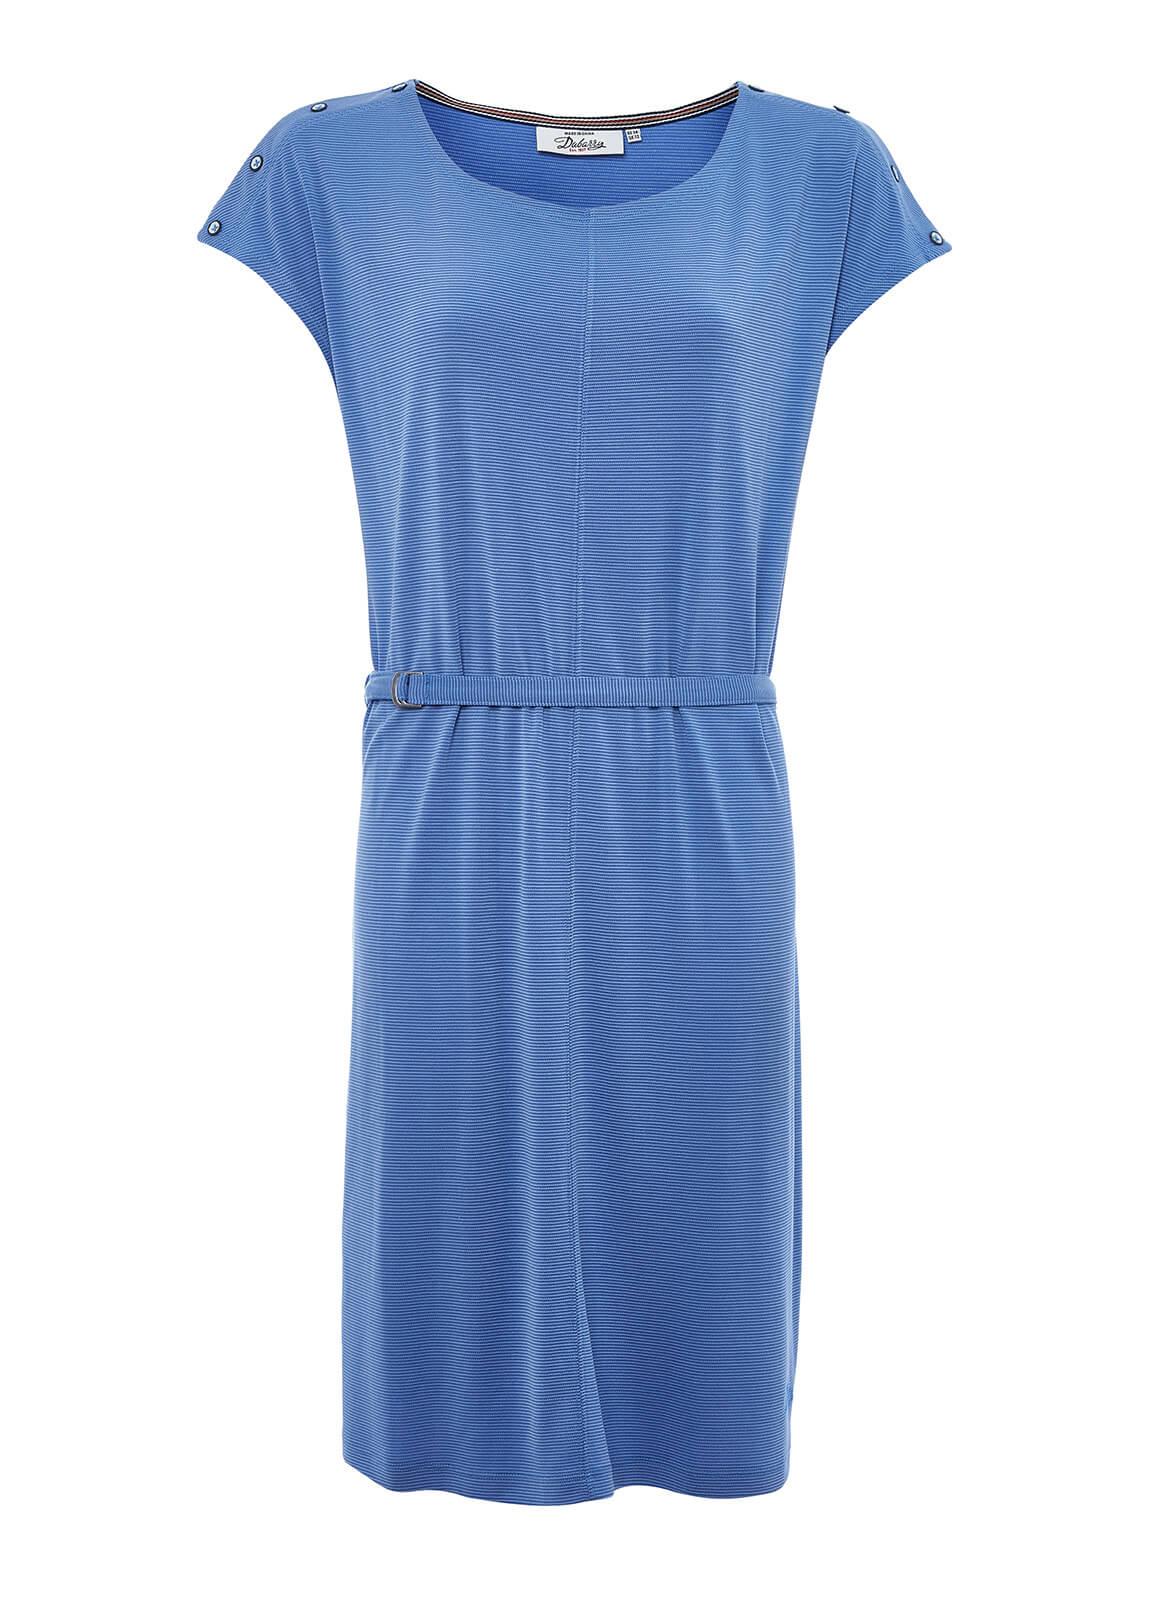 Kilcullen Dress - Blue